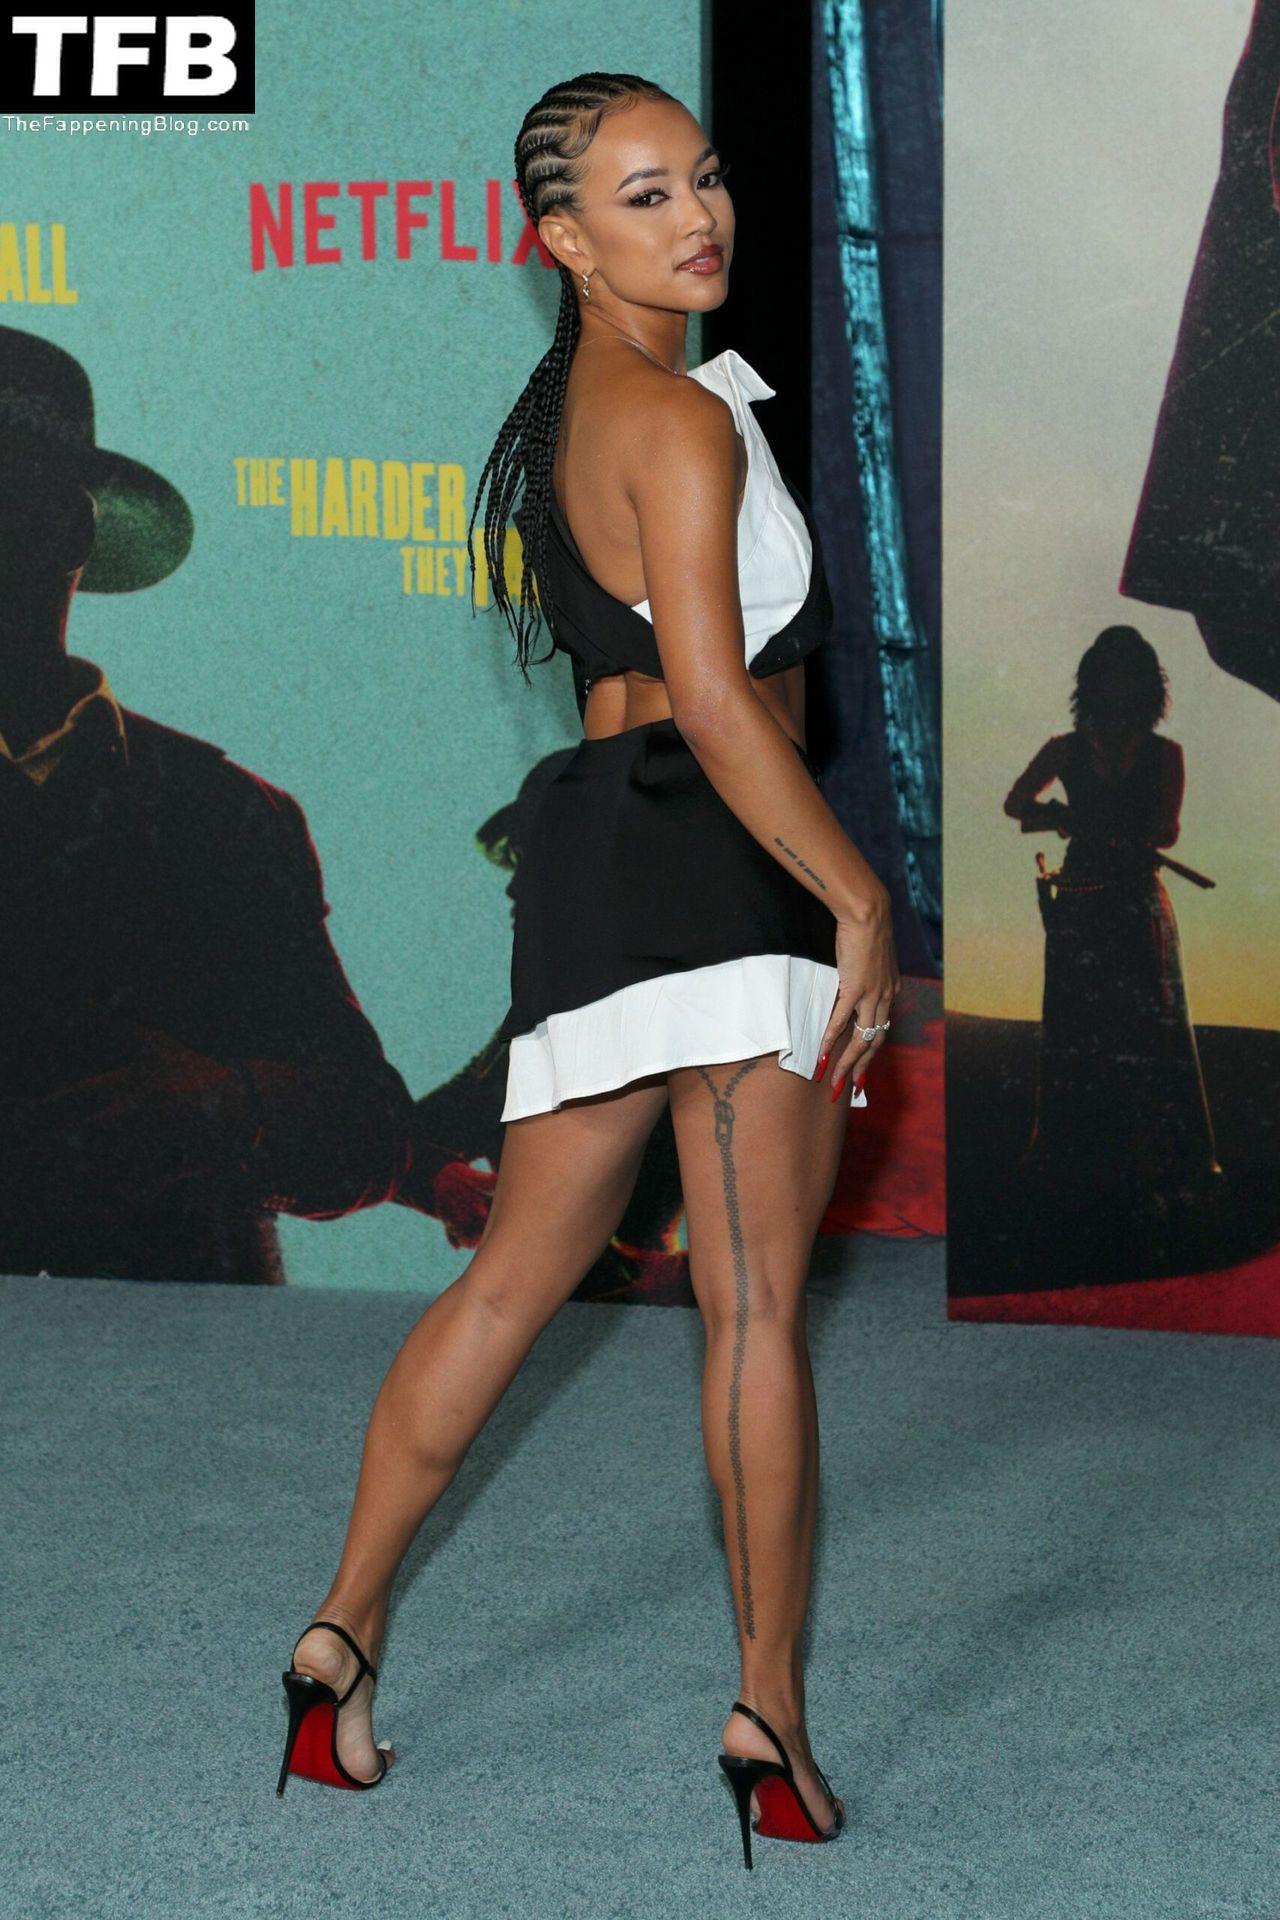 Karrueche-Tran-Sexy-Legs-Upskirt-The-Fappening-Blog-17.jpg